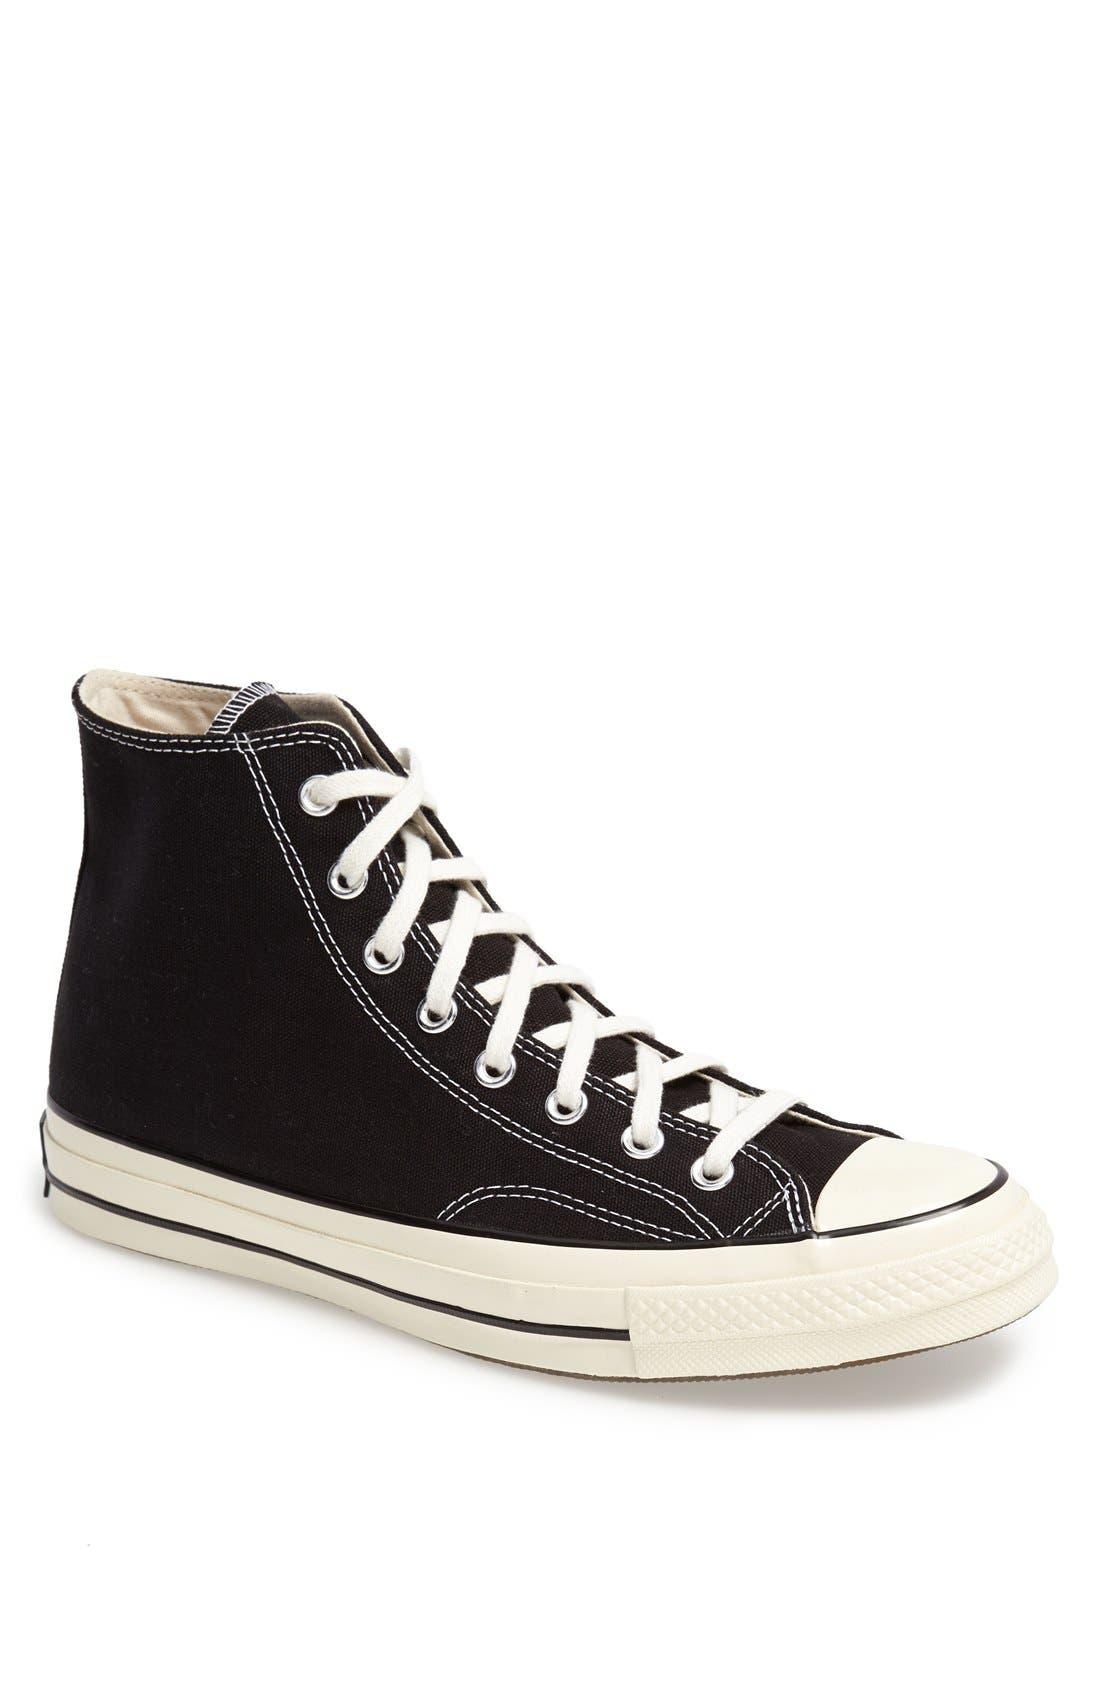 Chuck Taylor<sup>®</sup> All Star<sup>®</sup> '70 High Sneaker,                             Main thumbnail 1, color,